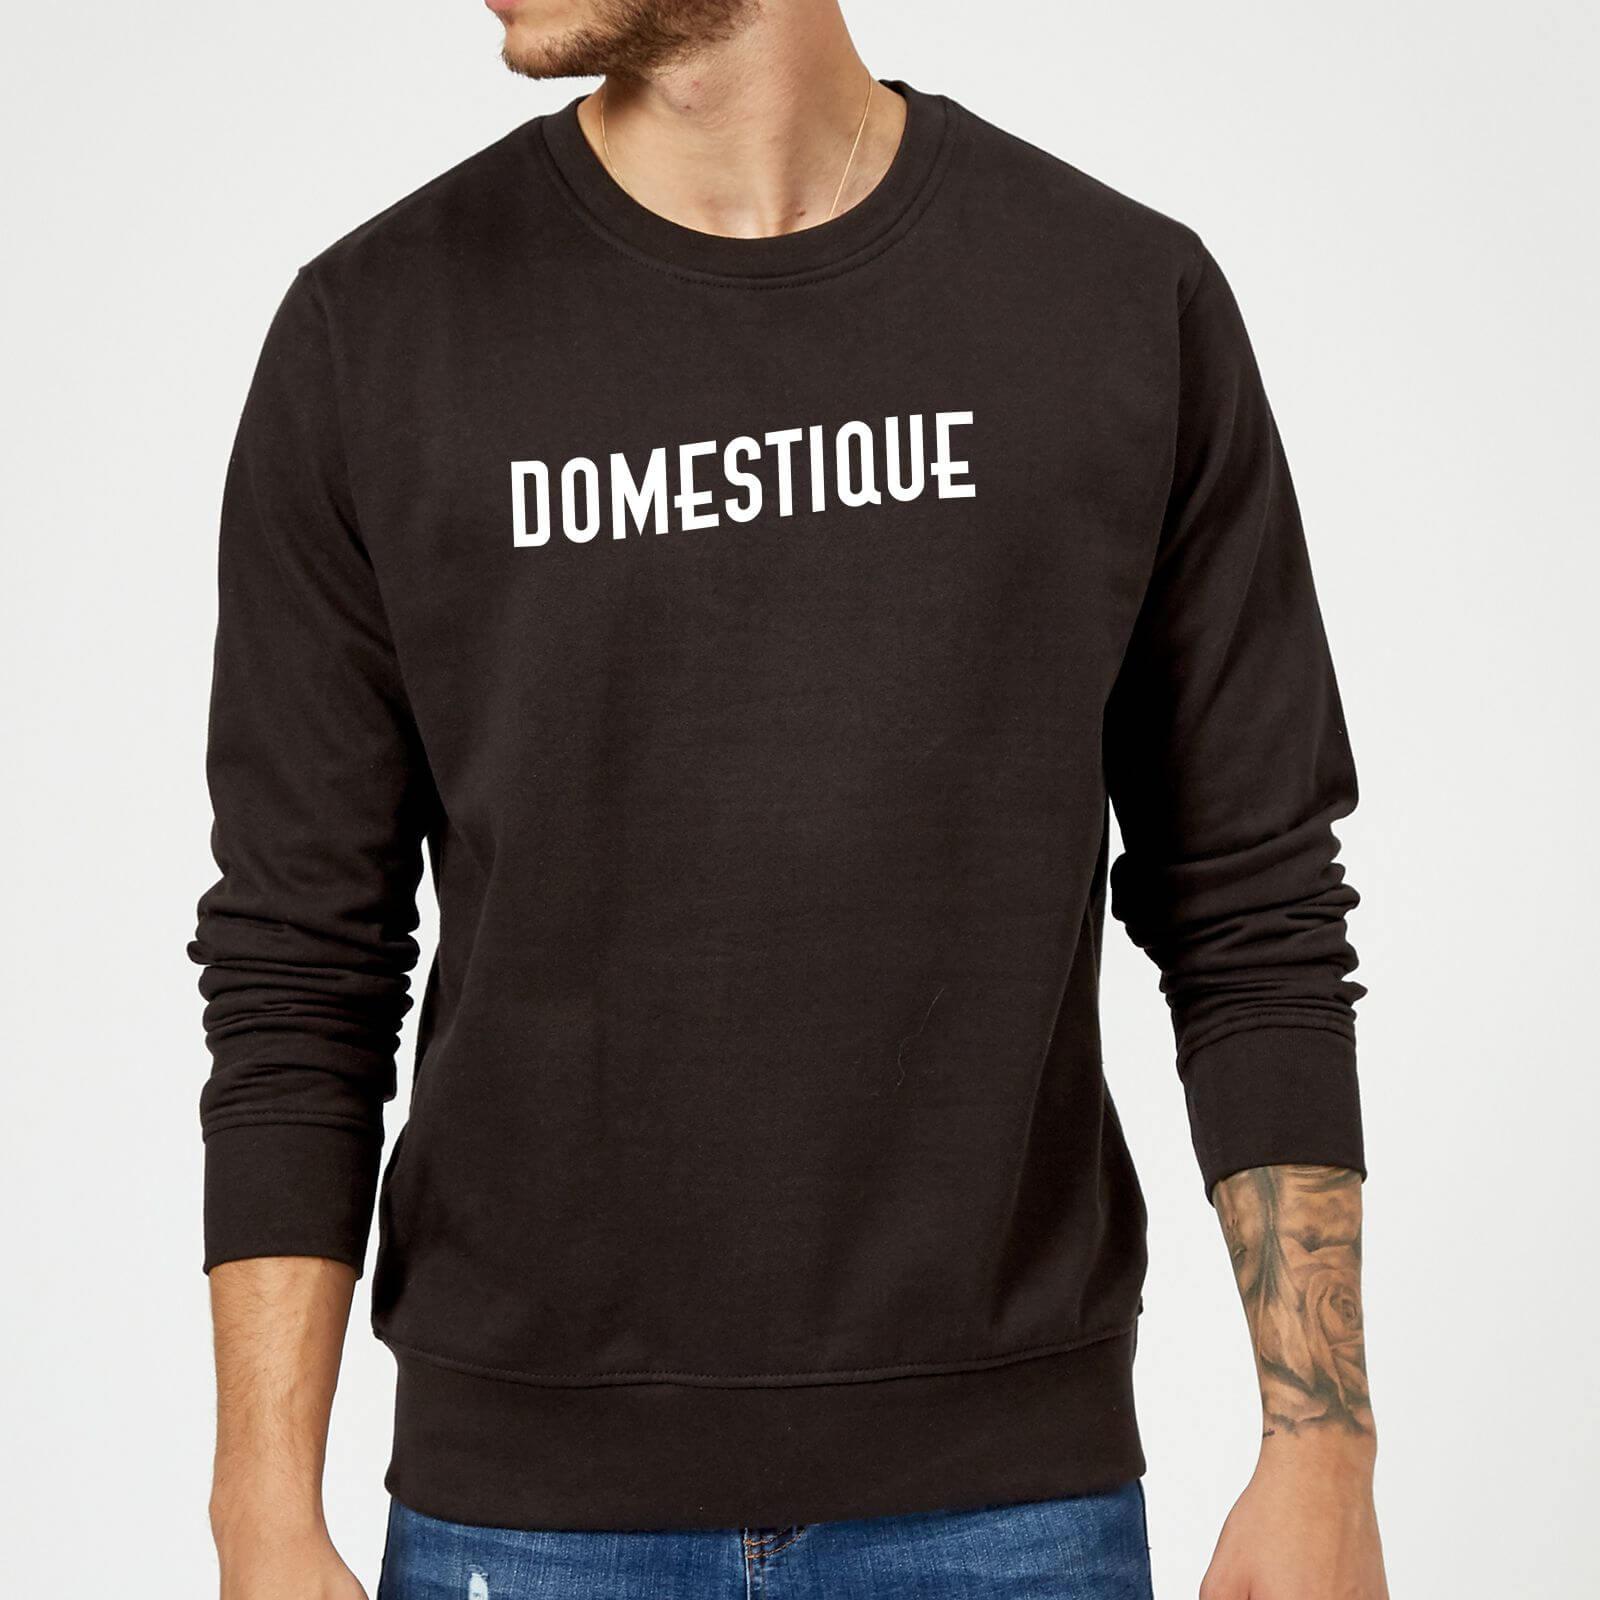 Domestique Sweatshirt - XXL - Grau